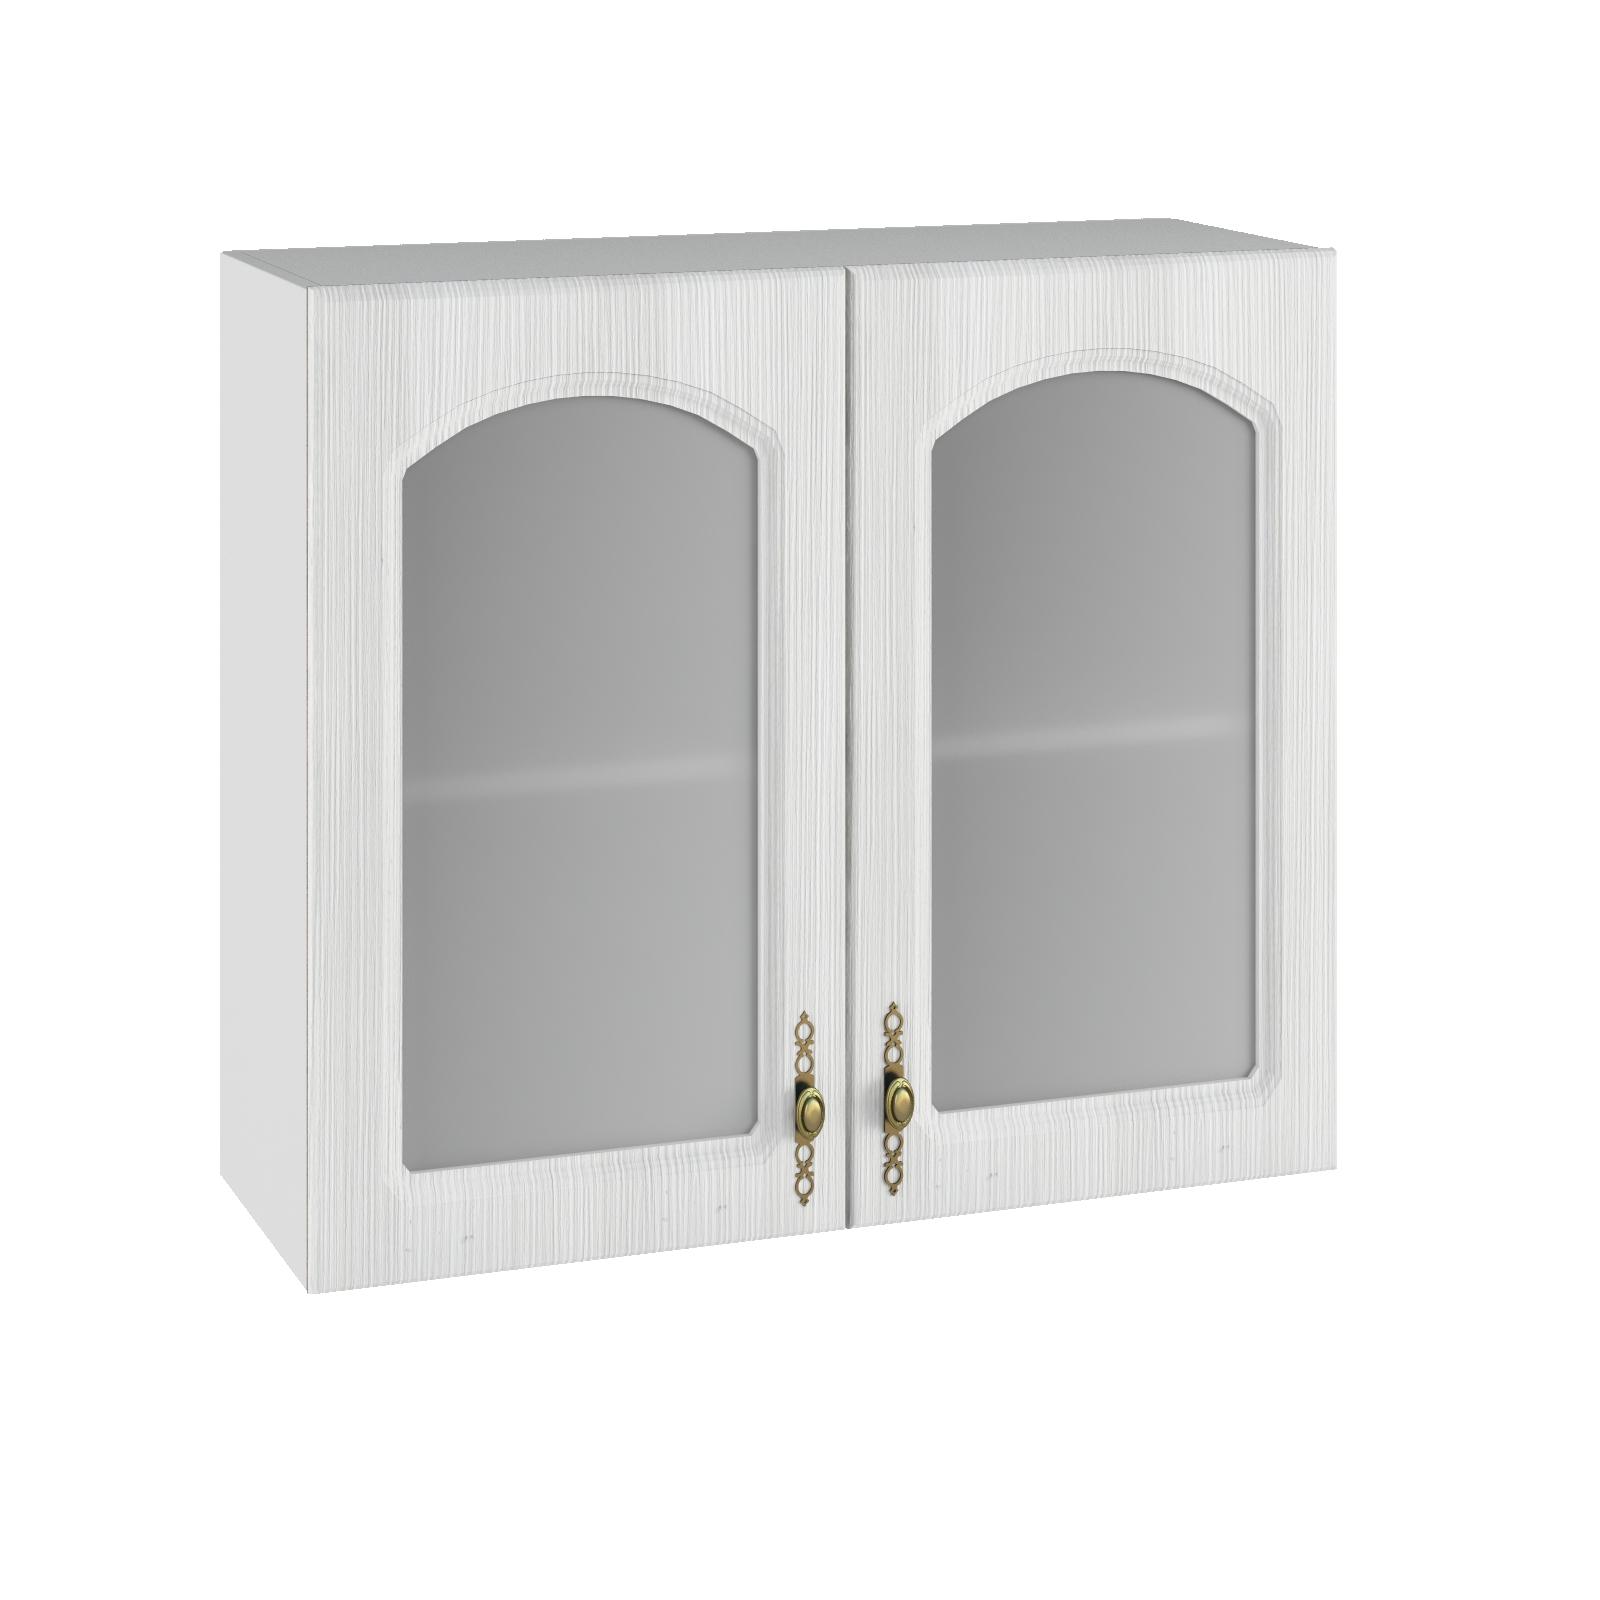 Кухня Монако ПС 800 Шкаф верхний стекло